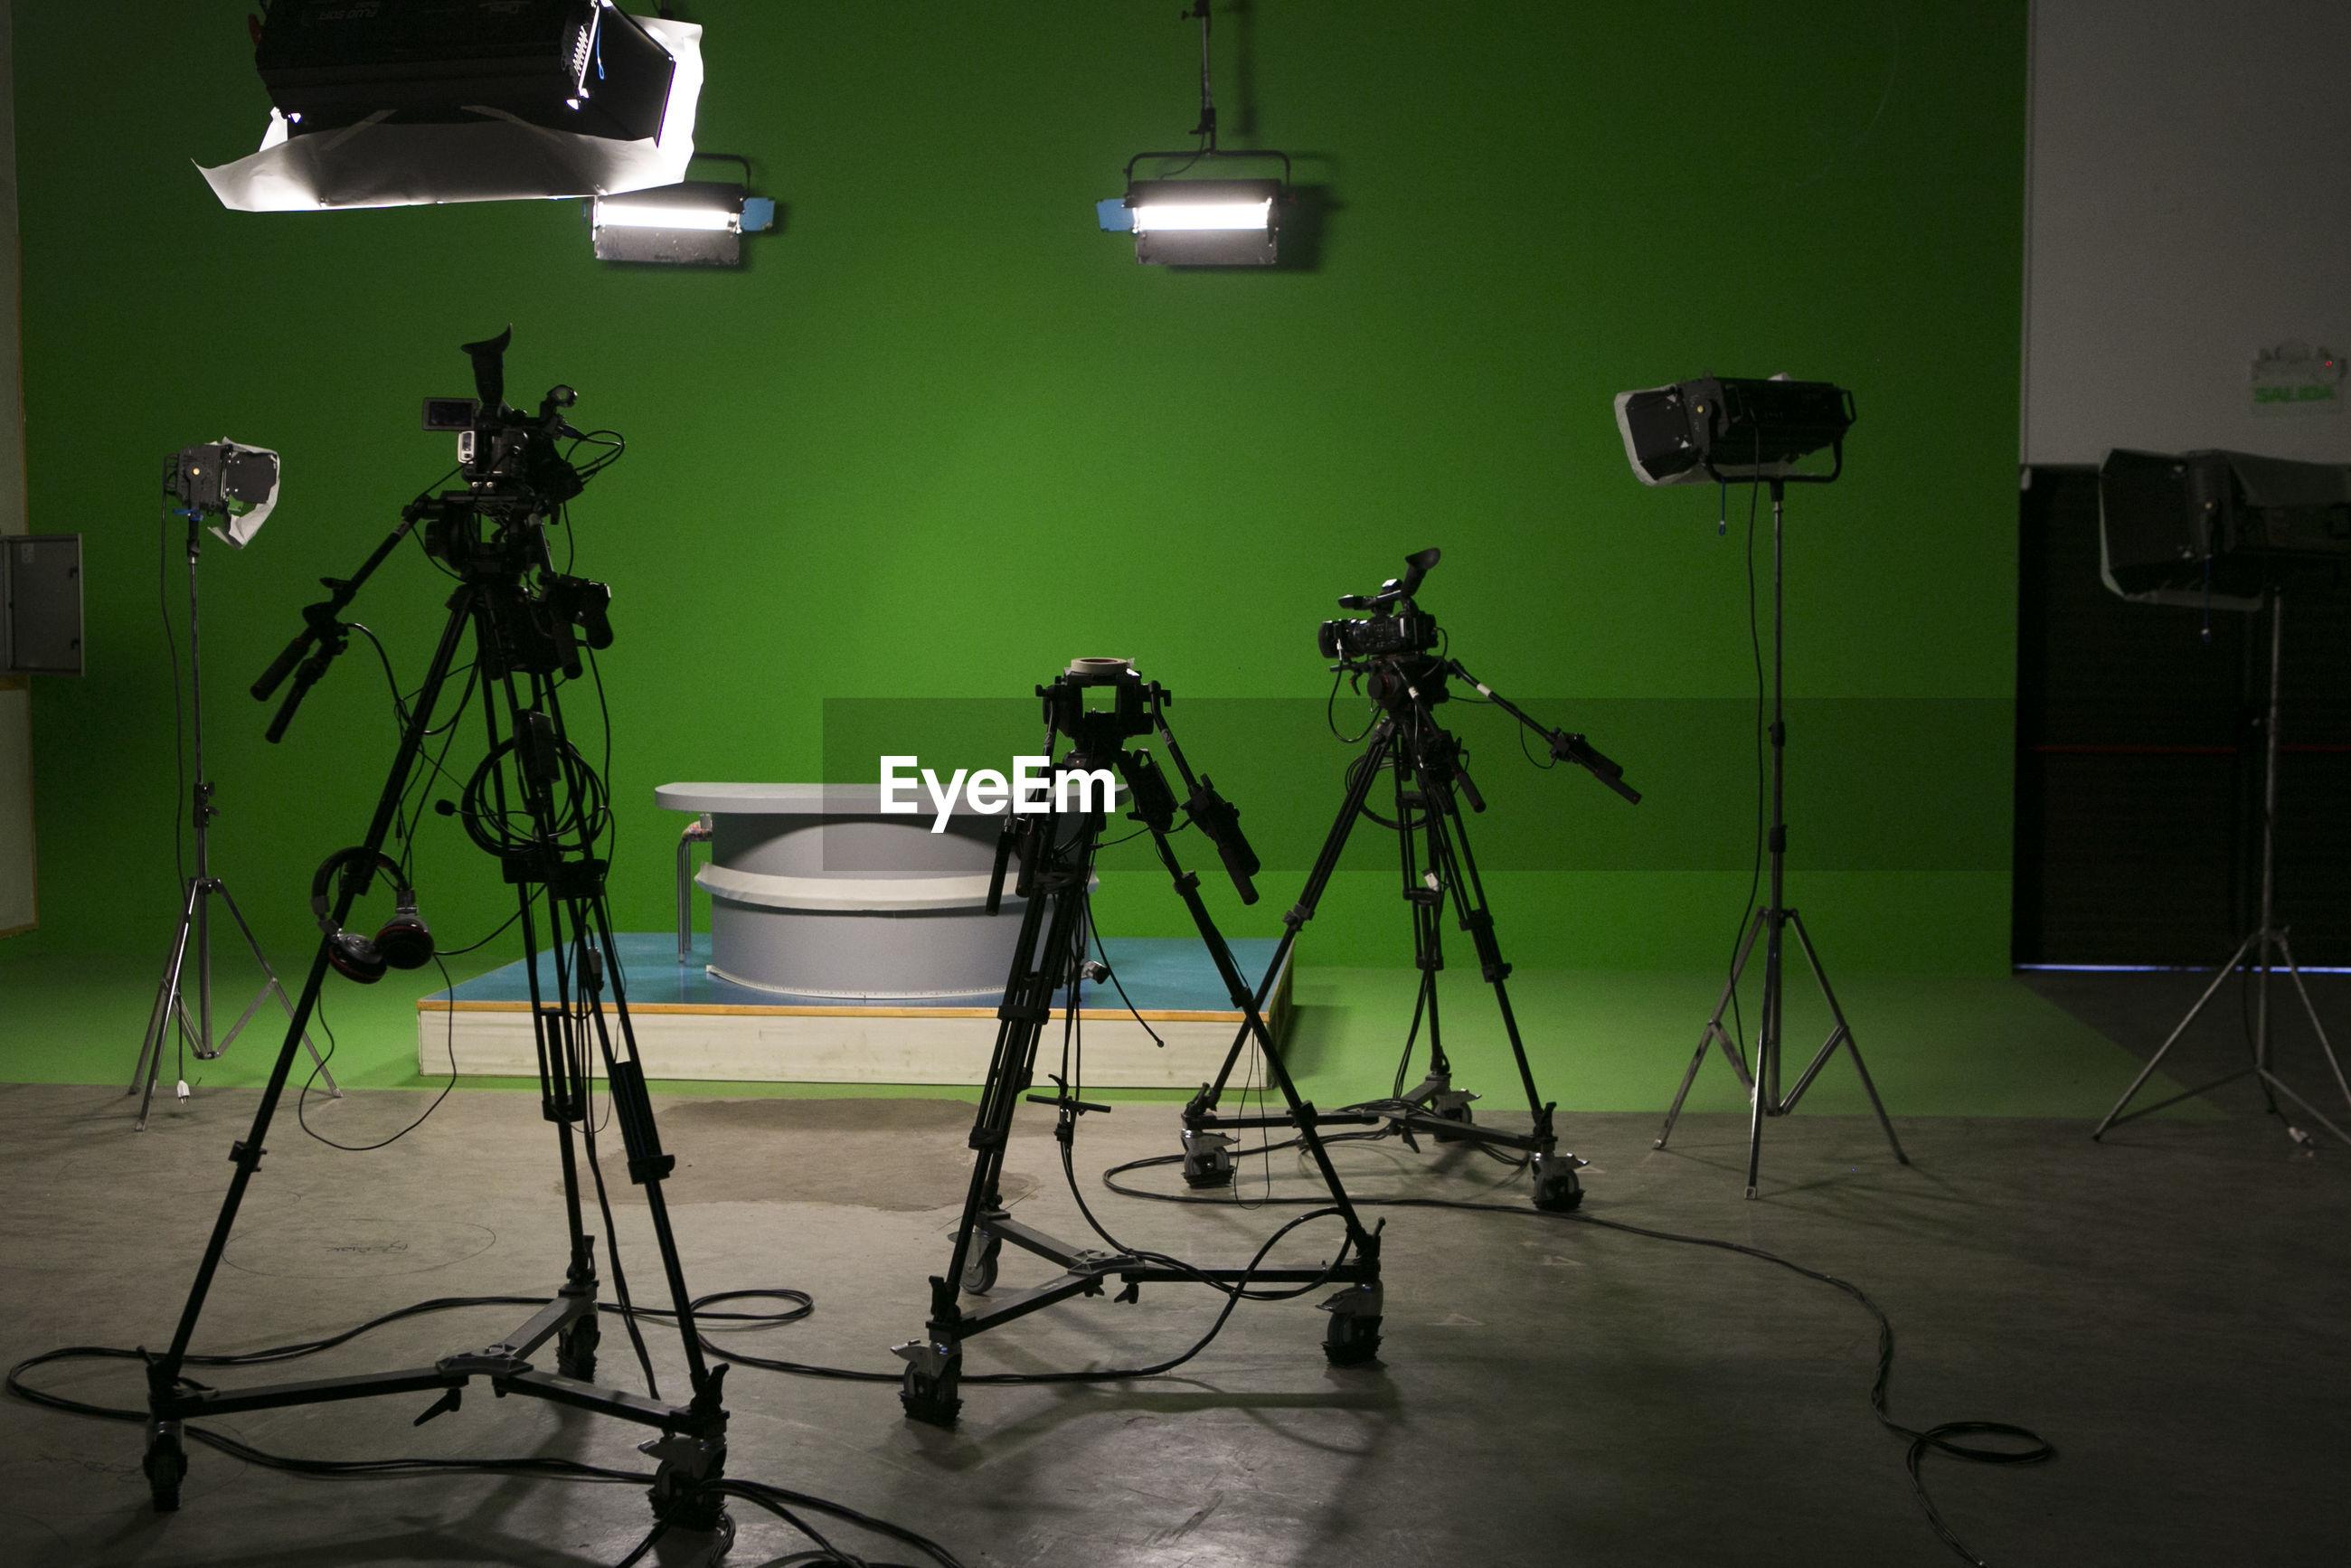 Camera on tripods in film studio